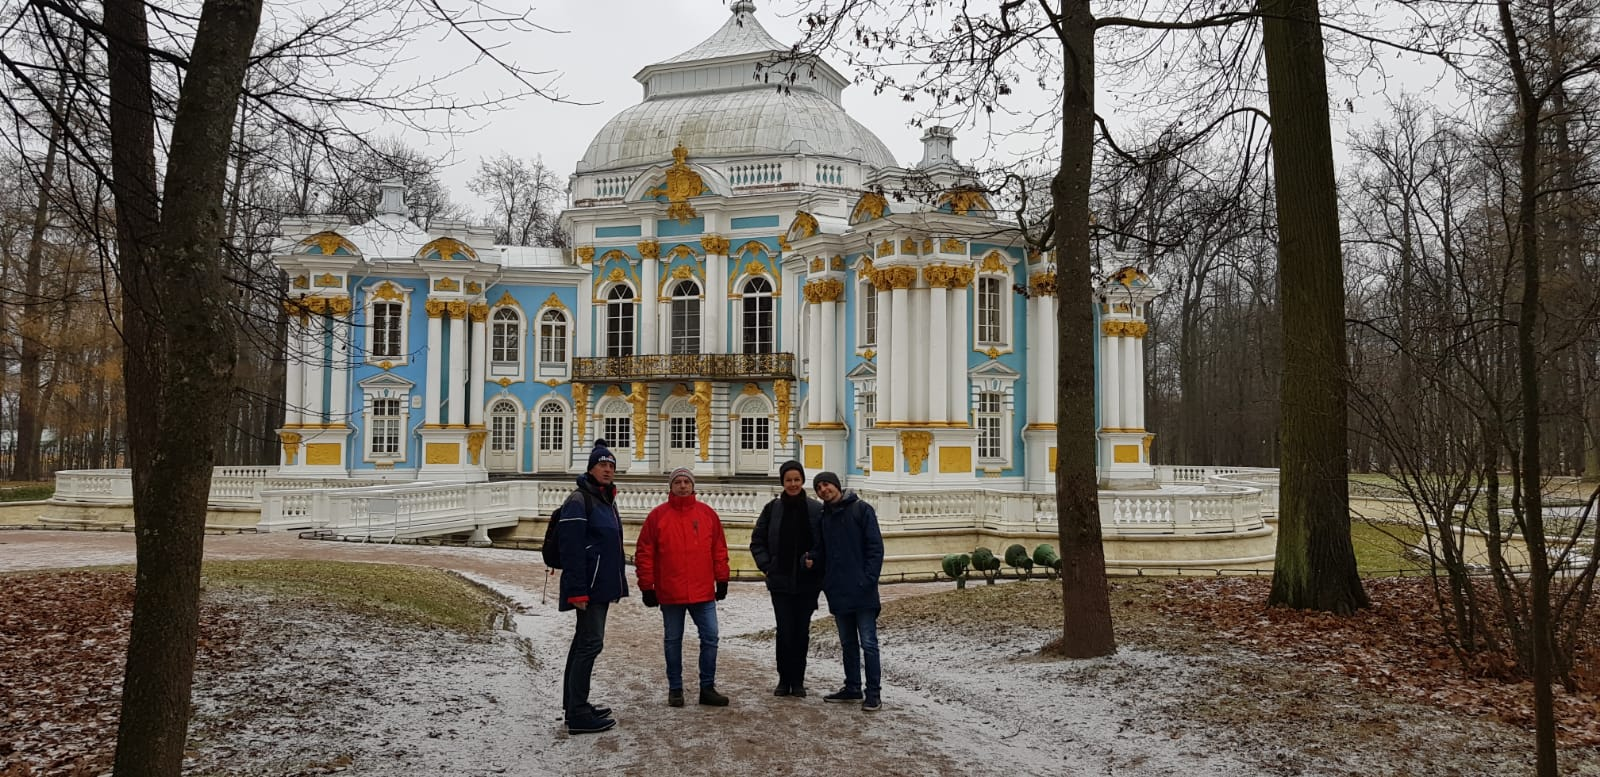 pavillon Ermitage